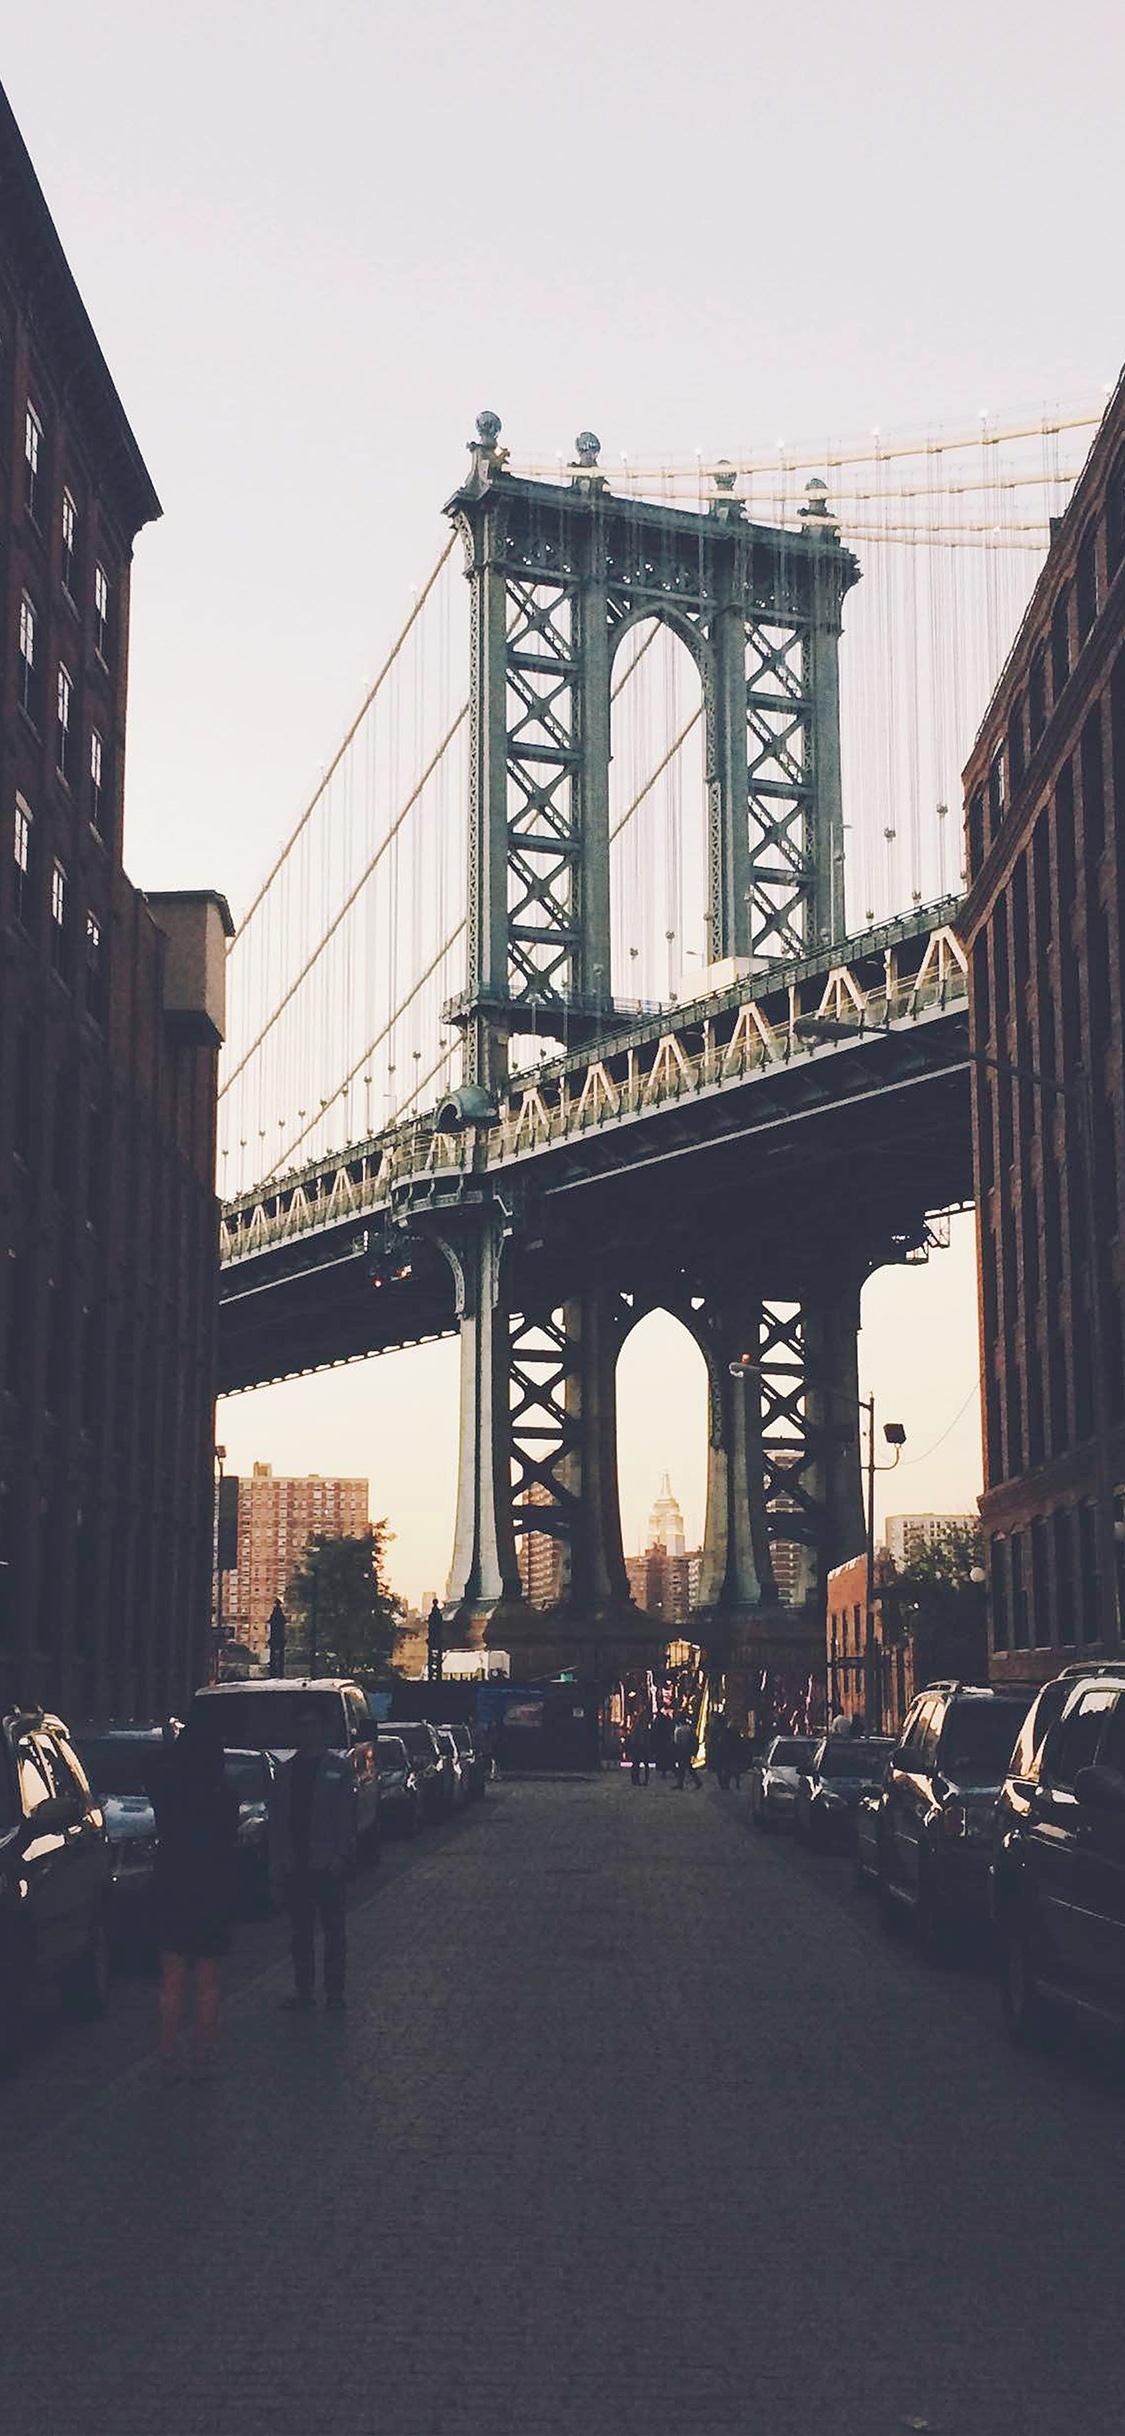 Iphone11papers Com Iphone11 Wallpaper Mx42 Newyork Bridge City Building Architecture Street